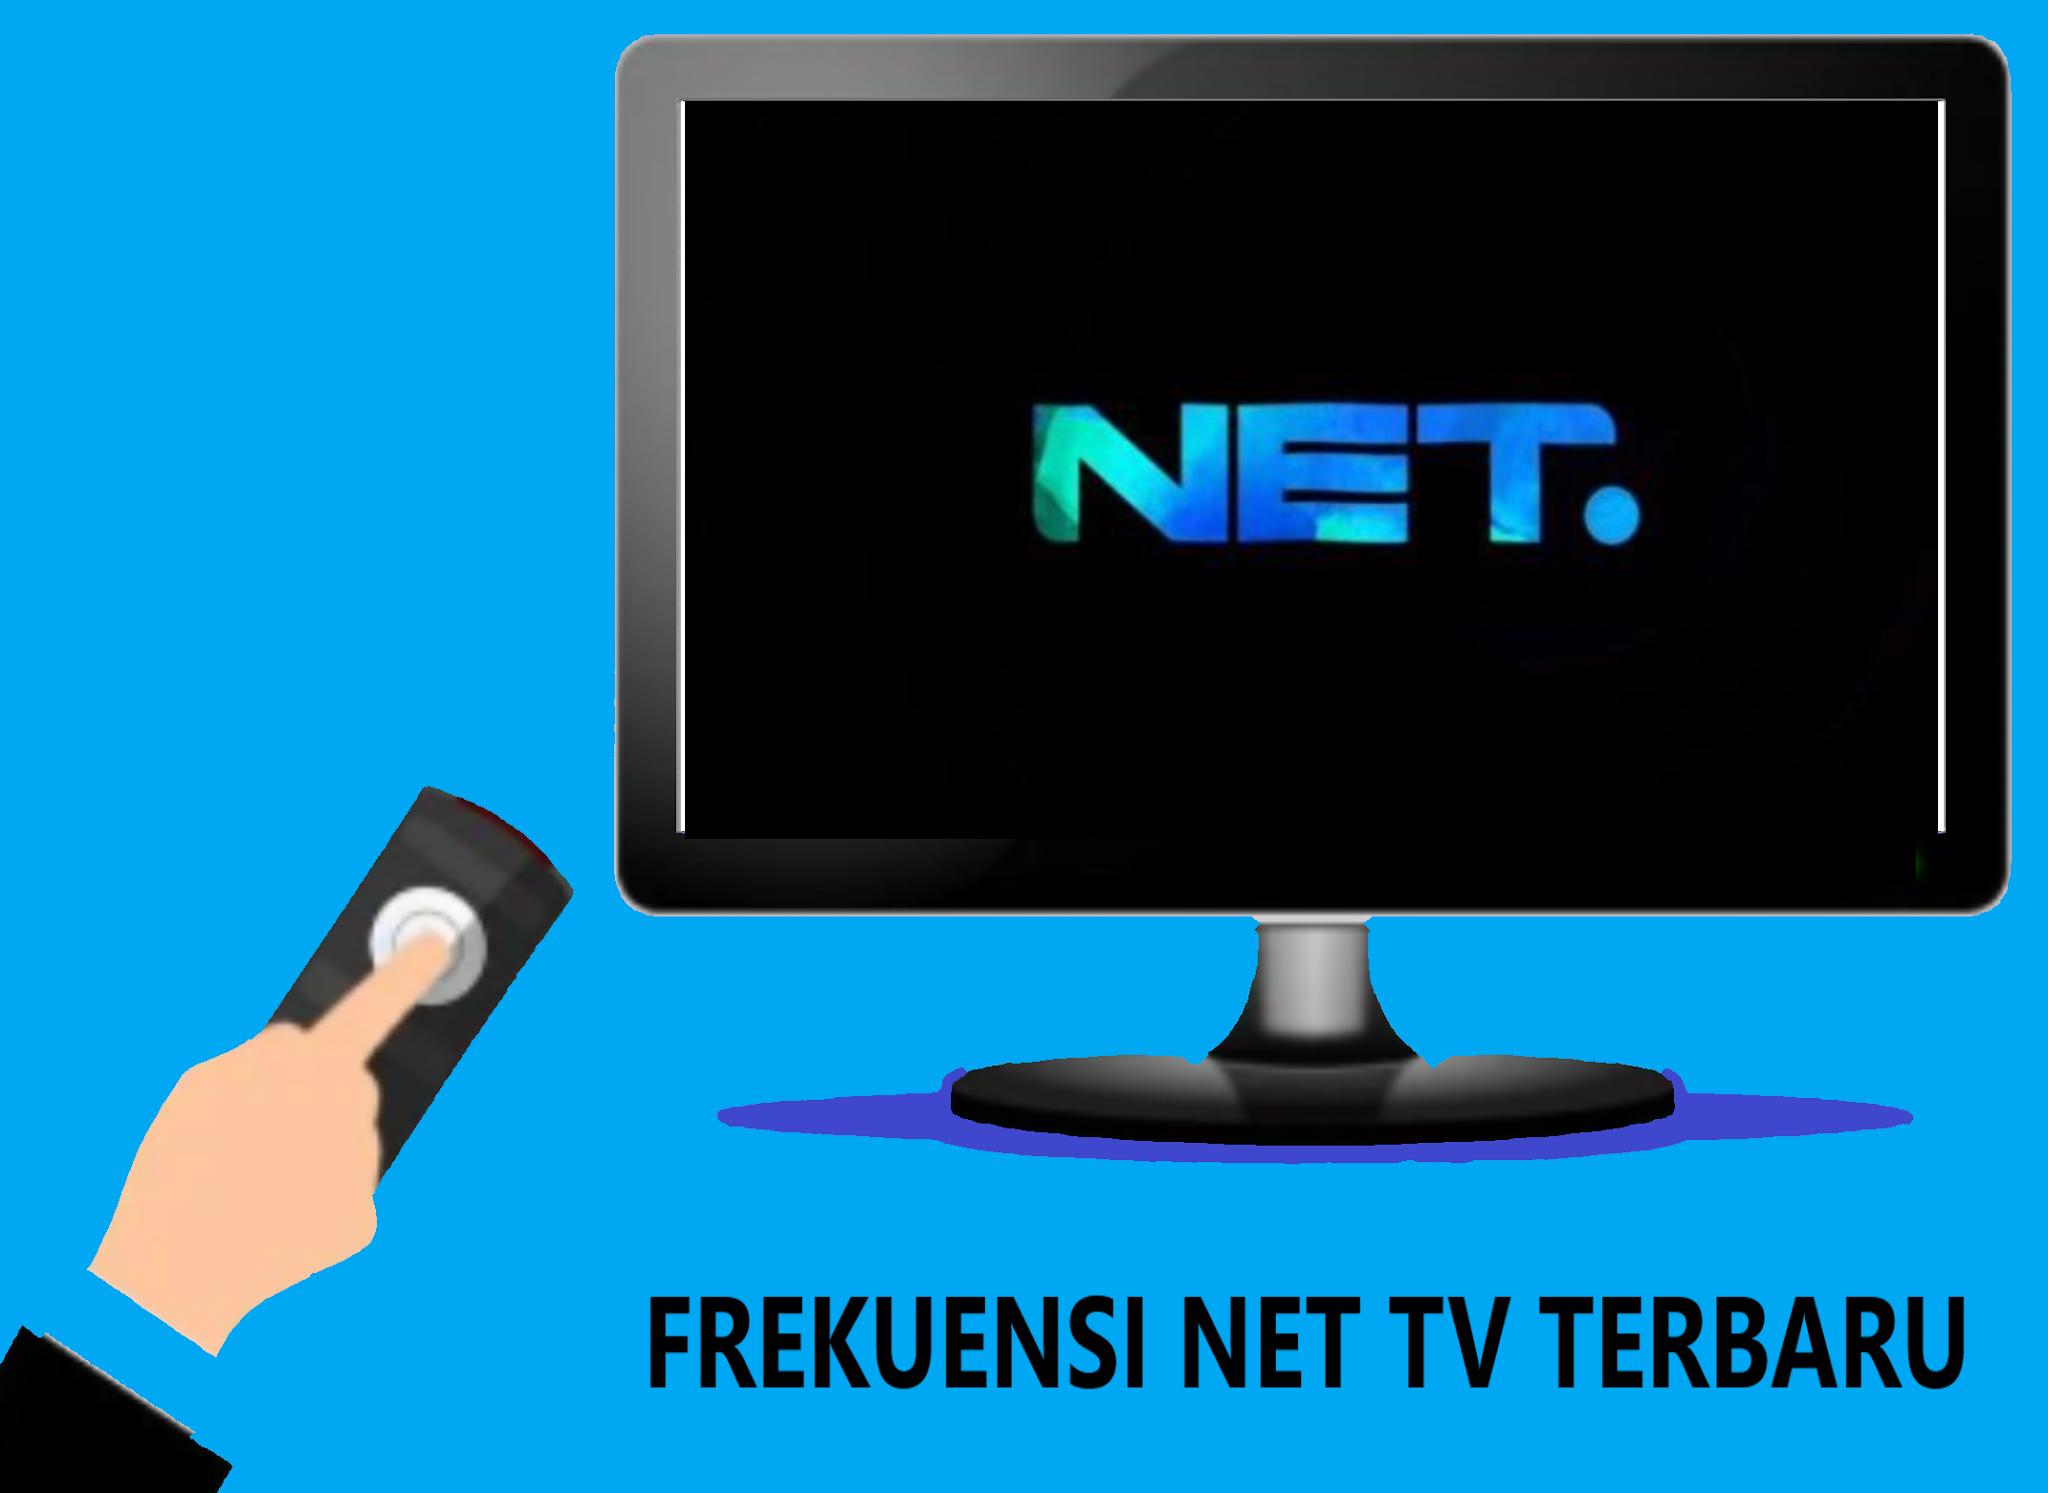 Frekuensi NET TV Terbaru 2020 Di Telkom 4